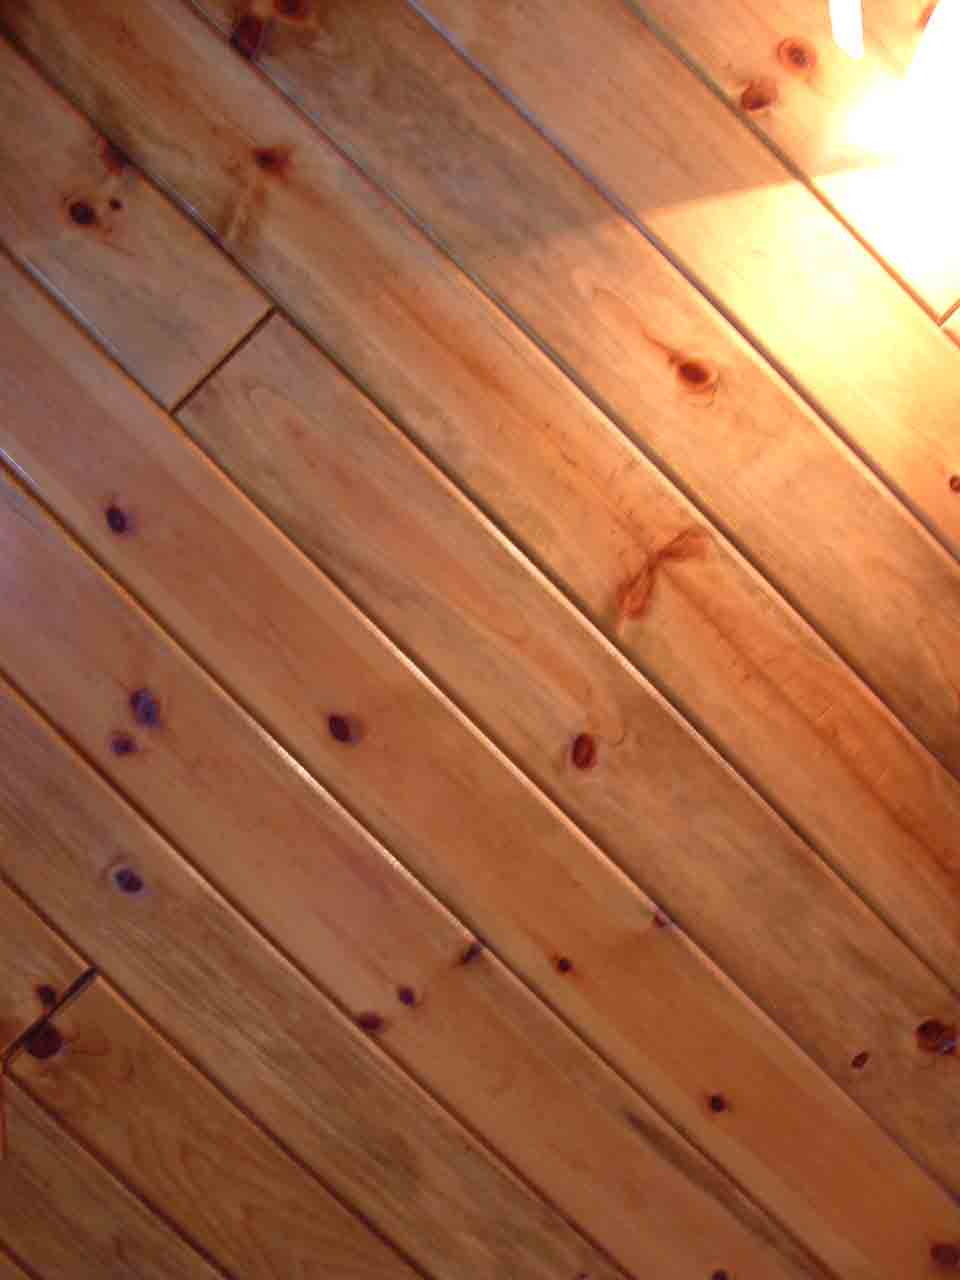 3x8 log siding hand hewn pine - 3x8 Log Siding Hand Hewn Pine 51